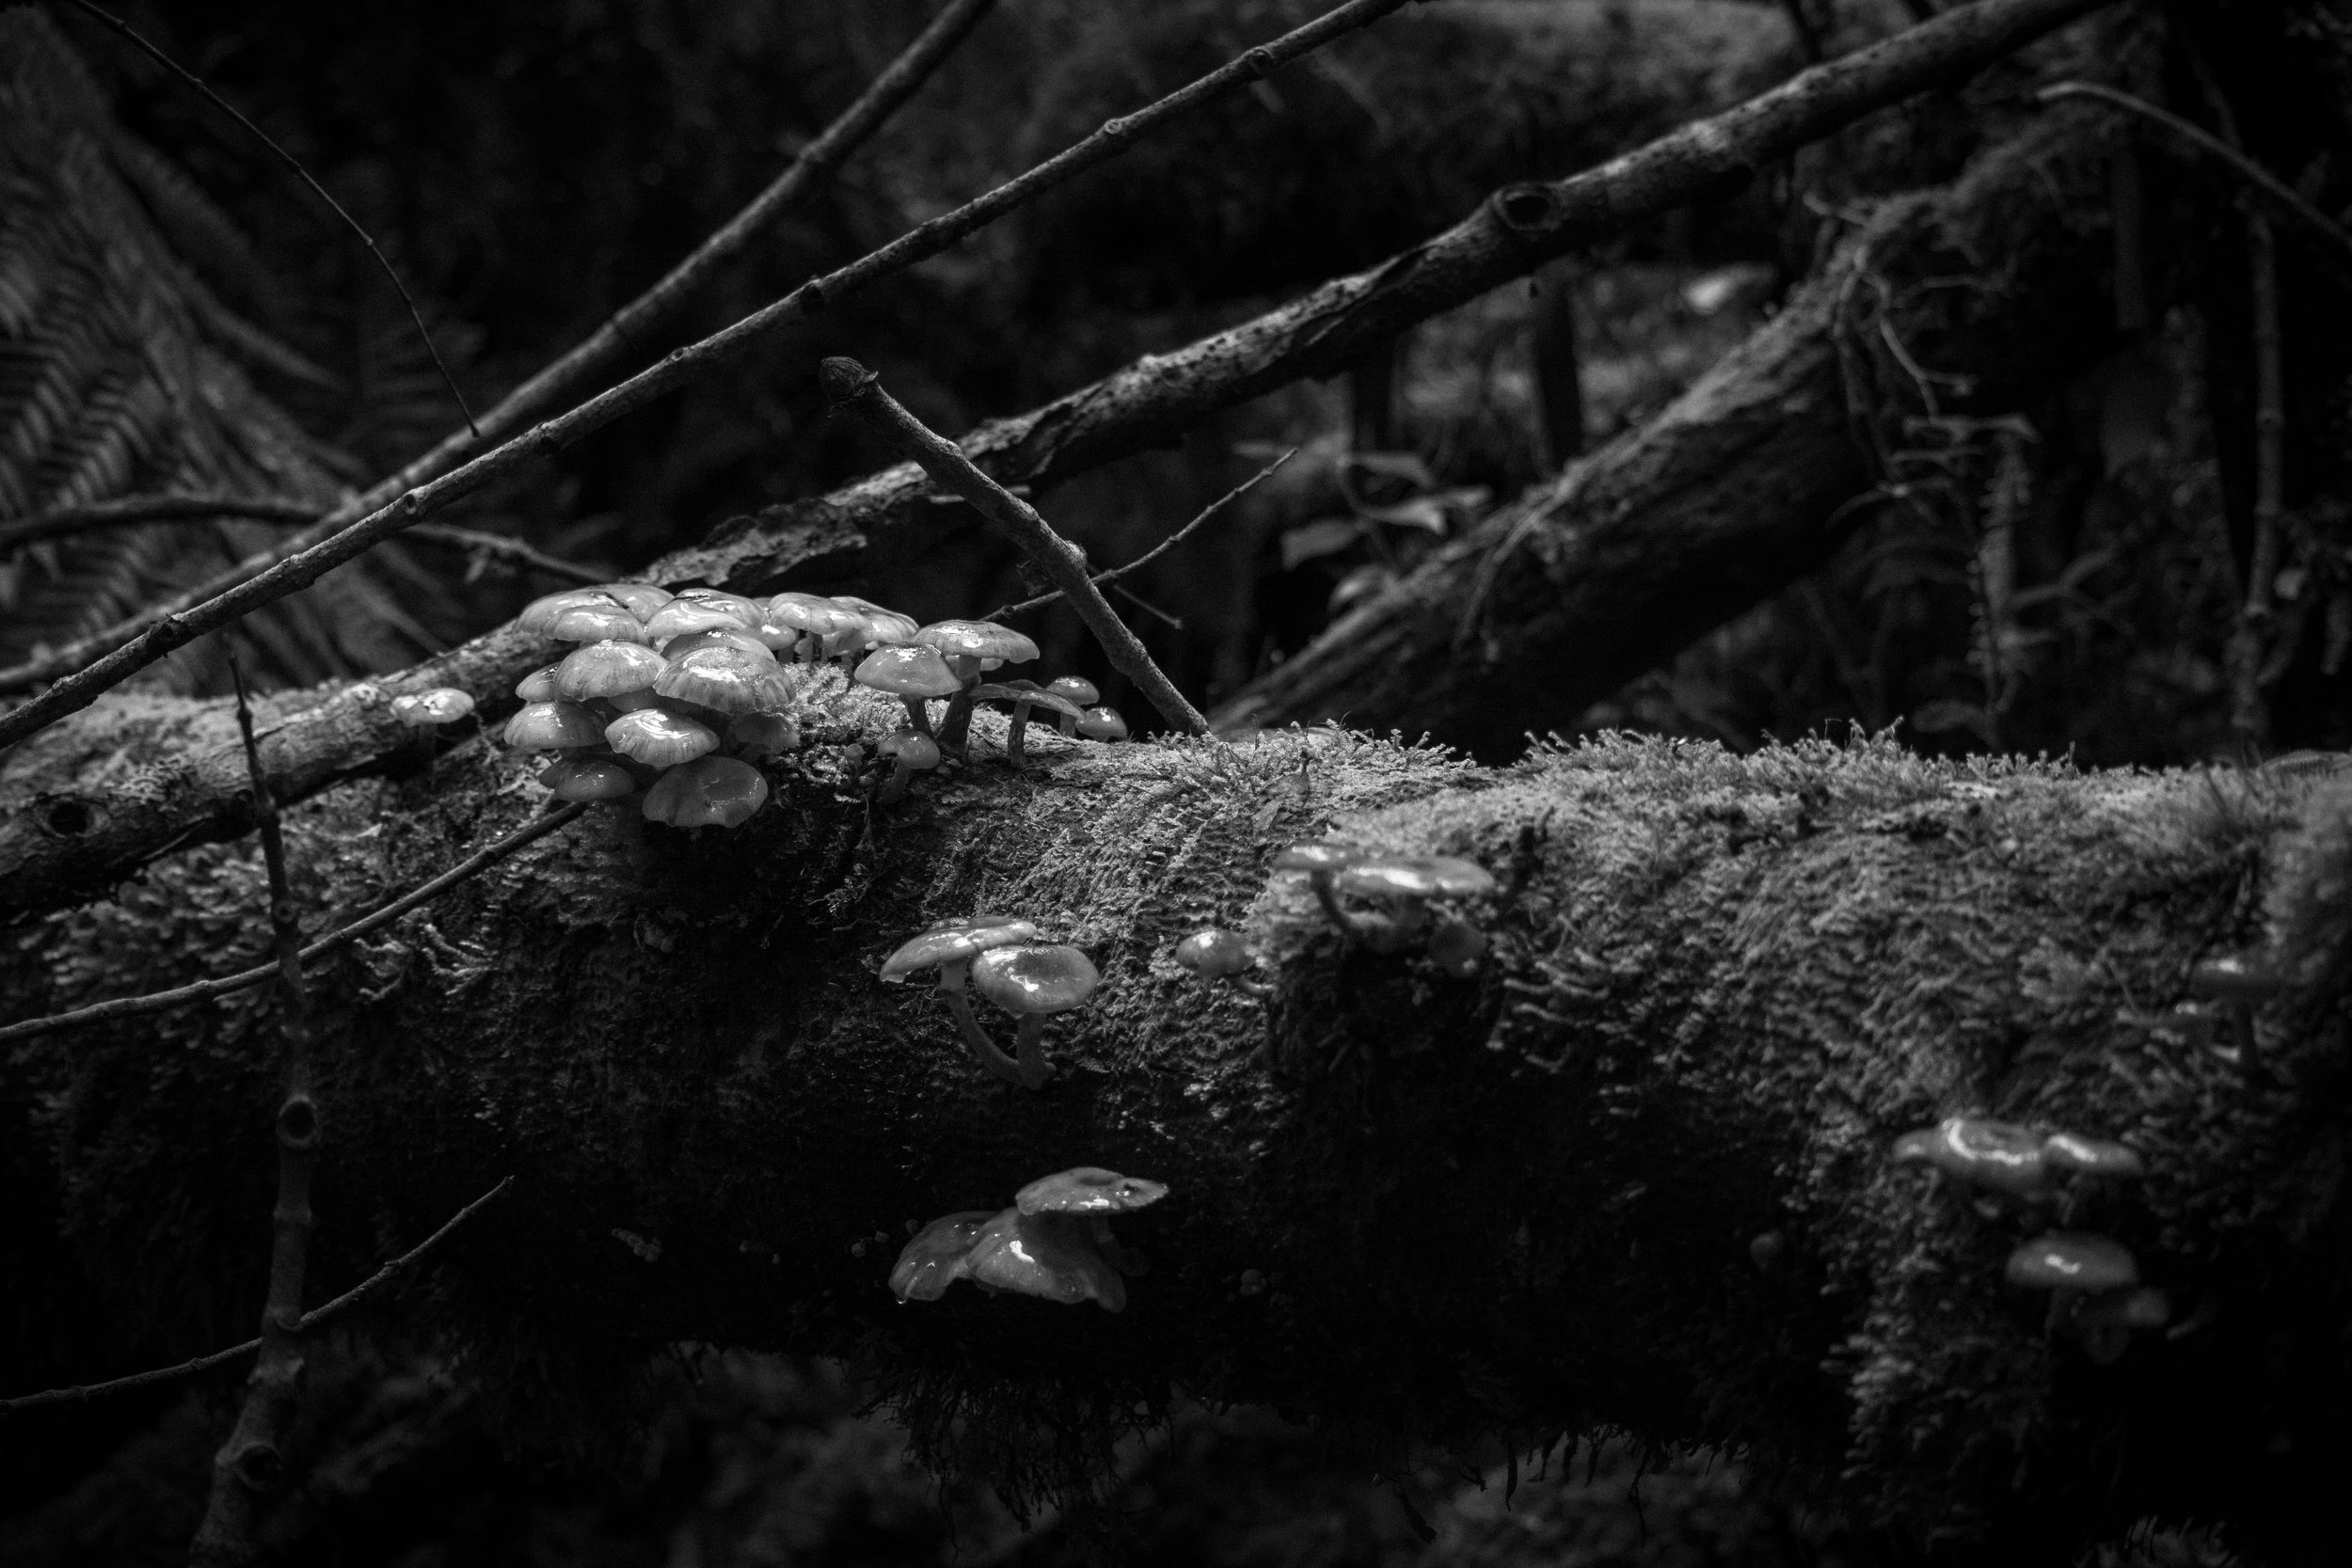 Fungi on a log   Nikon D7100.  Growling Swallet Track.  Tasmania, Australia.  (2018)